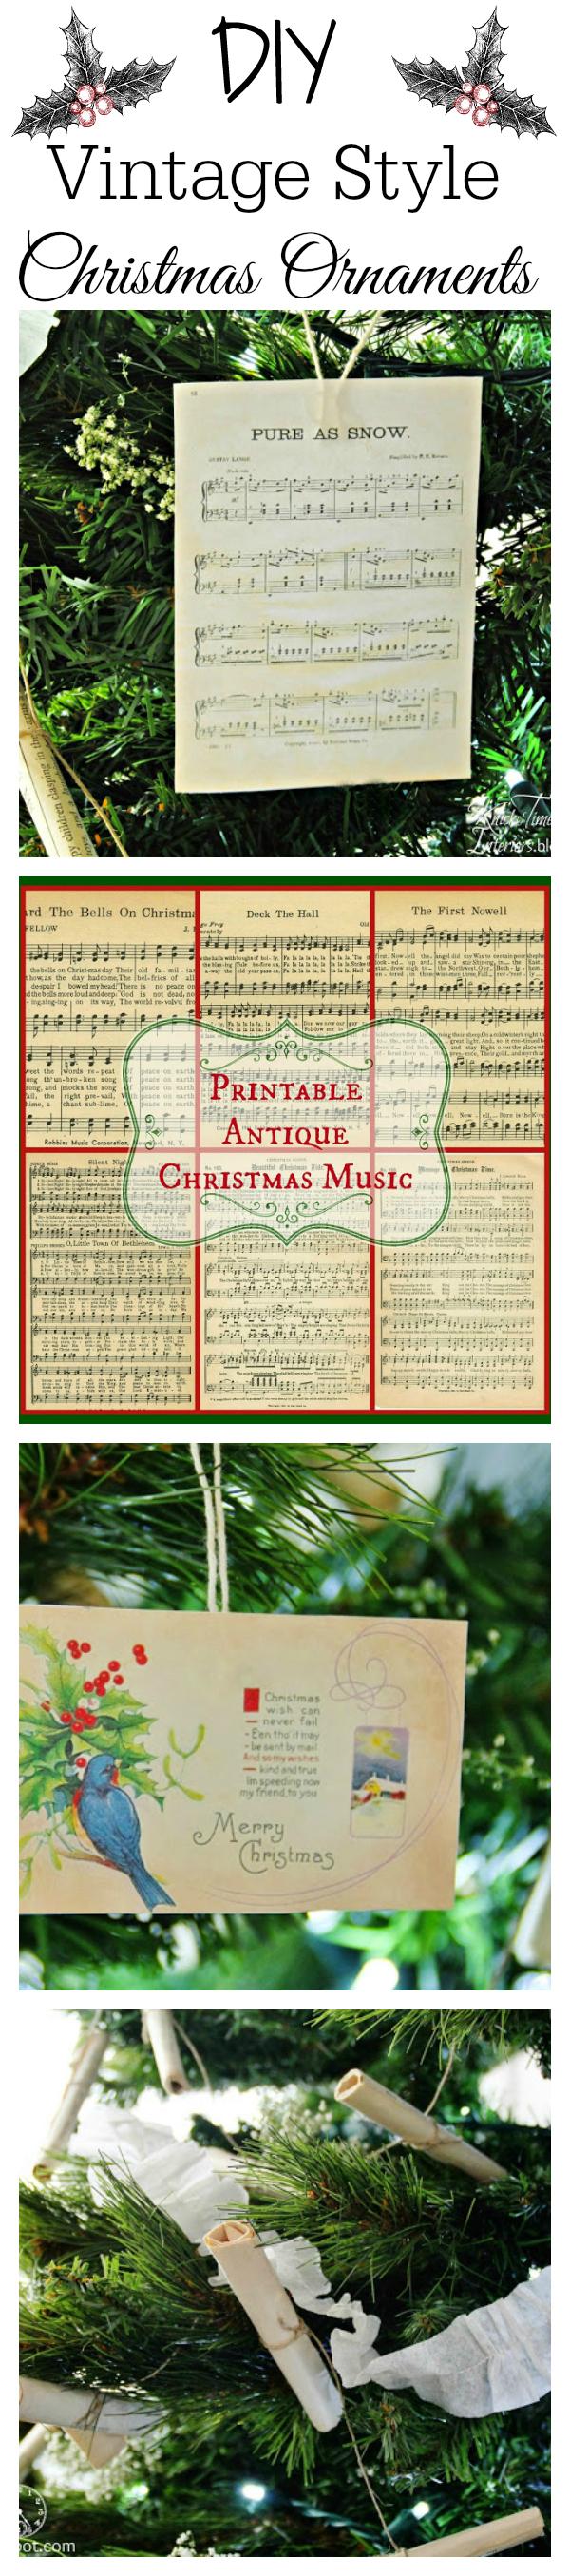 Vintage Style Christmas rree ornaments